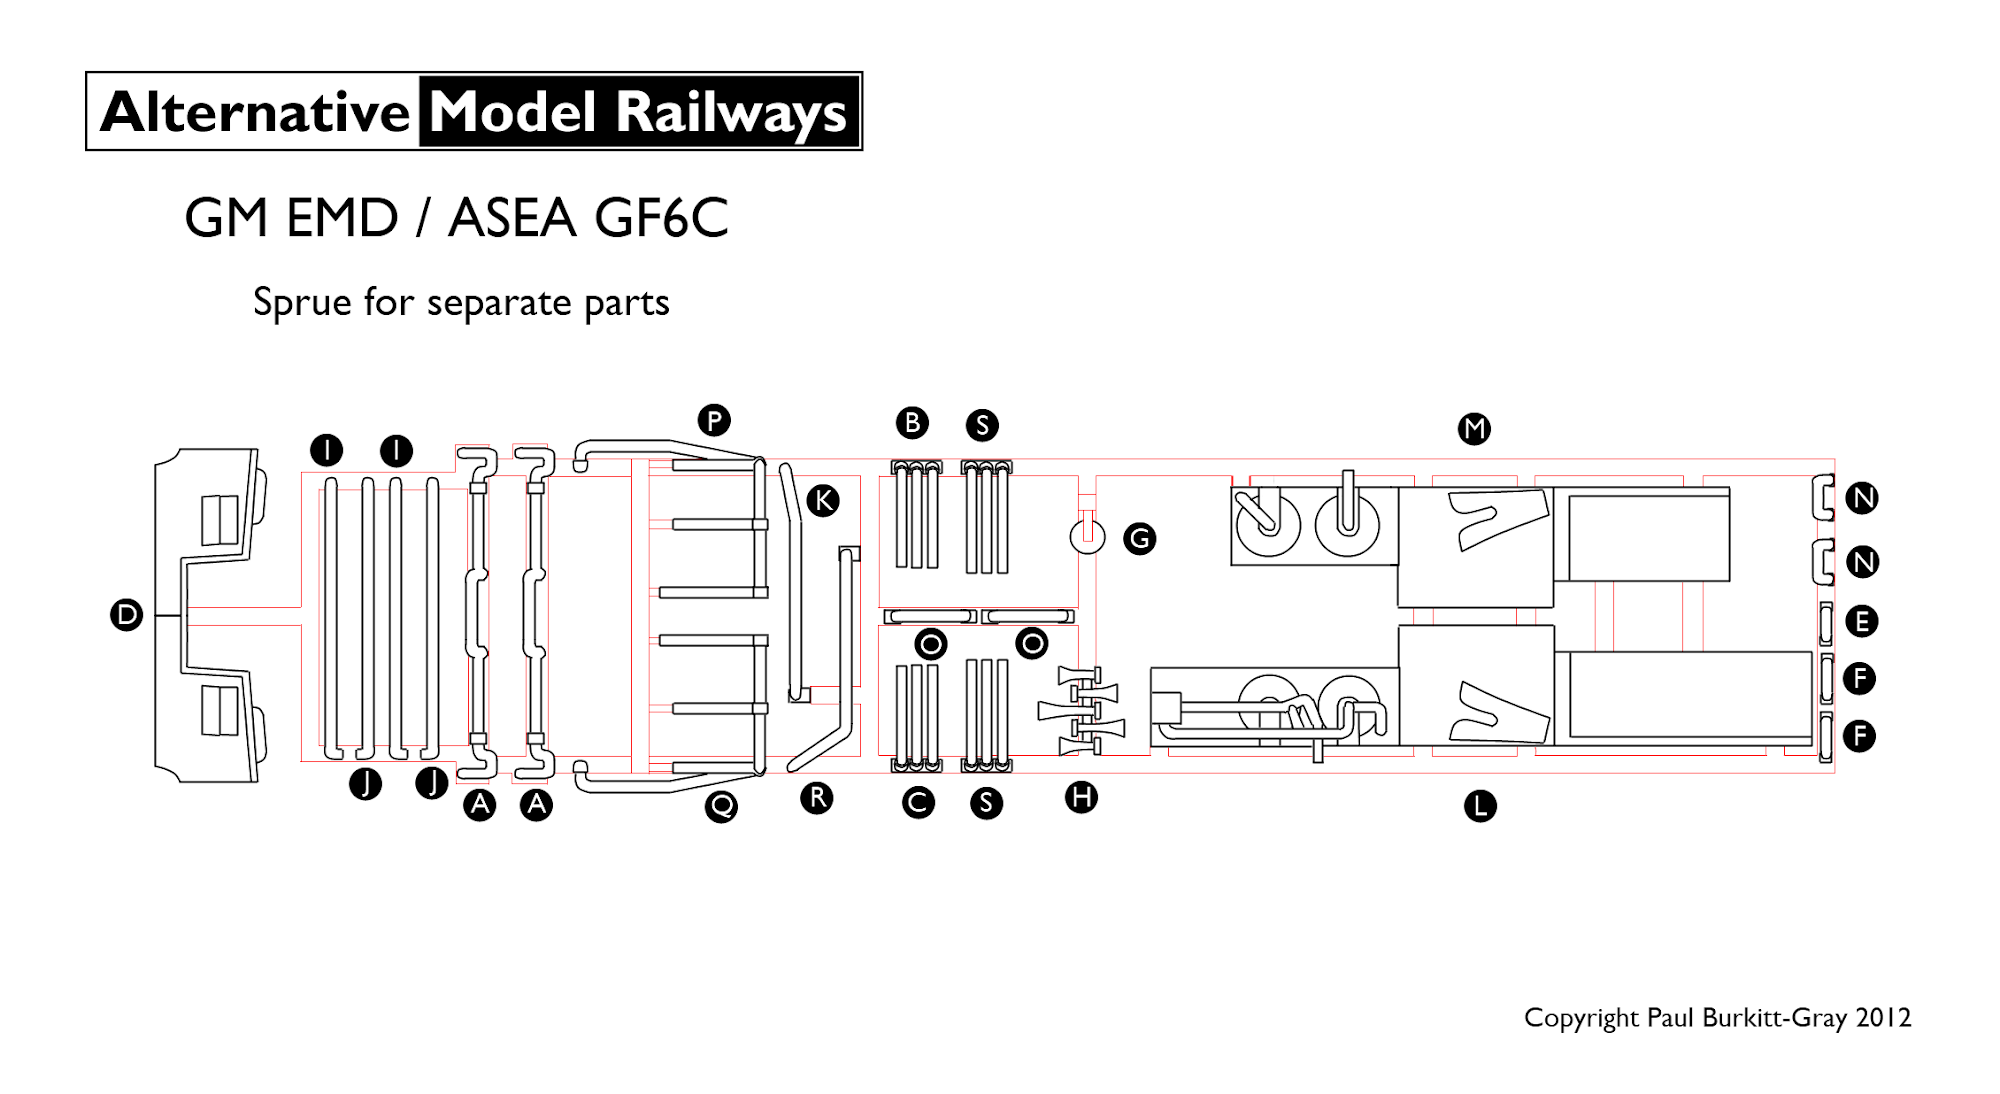 ngf6c1 n scale british columbia railway gf6c  a7cd4jpsj